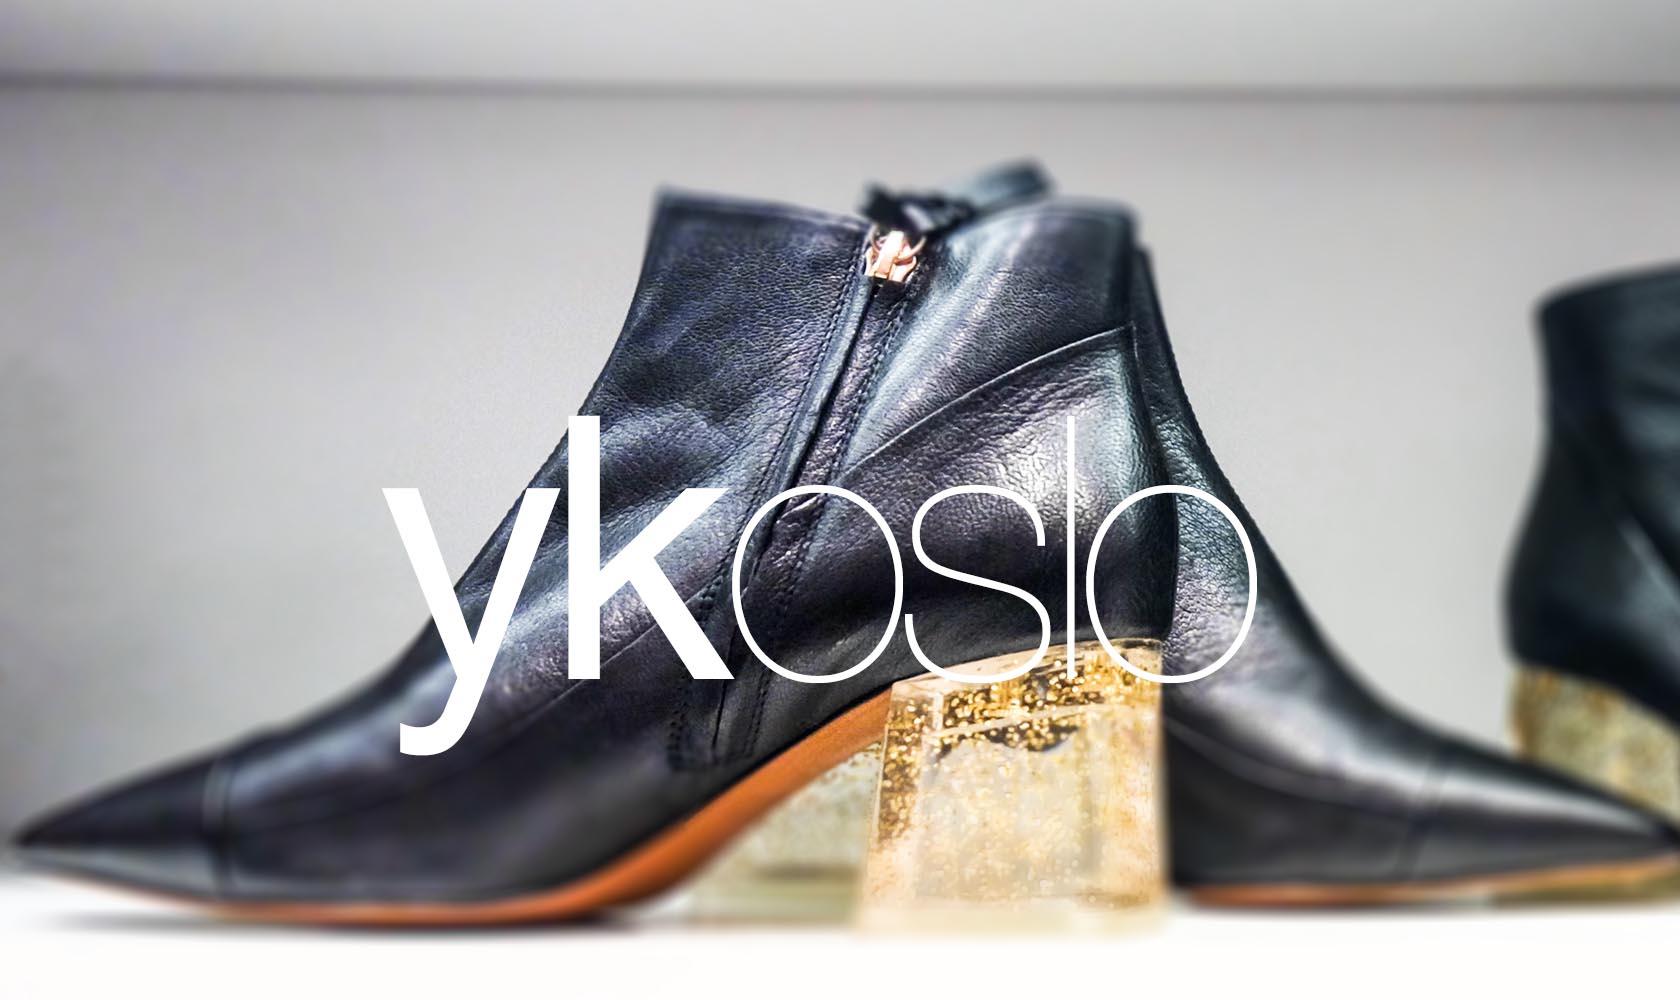 ykoslo__10